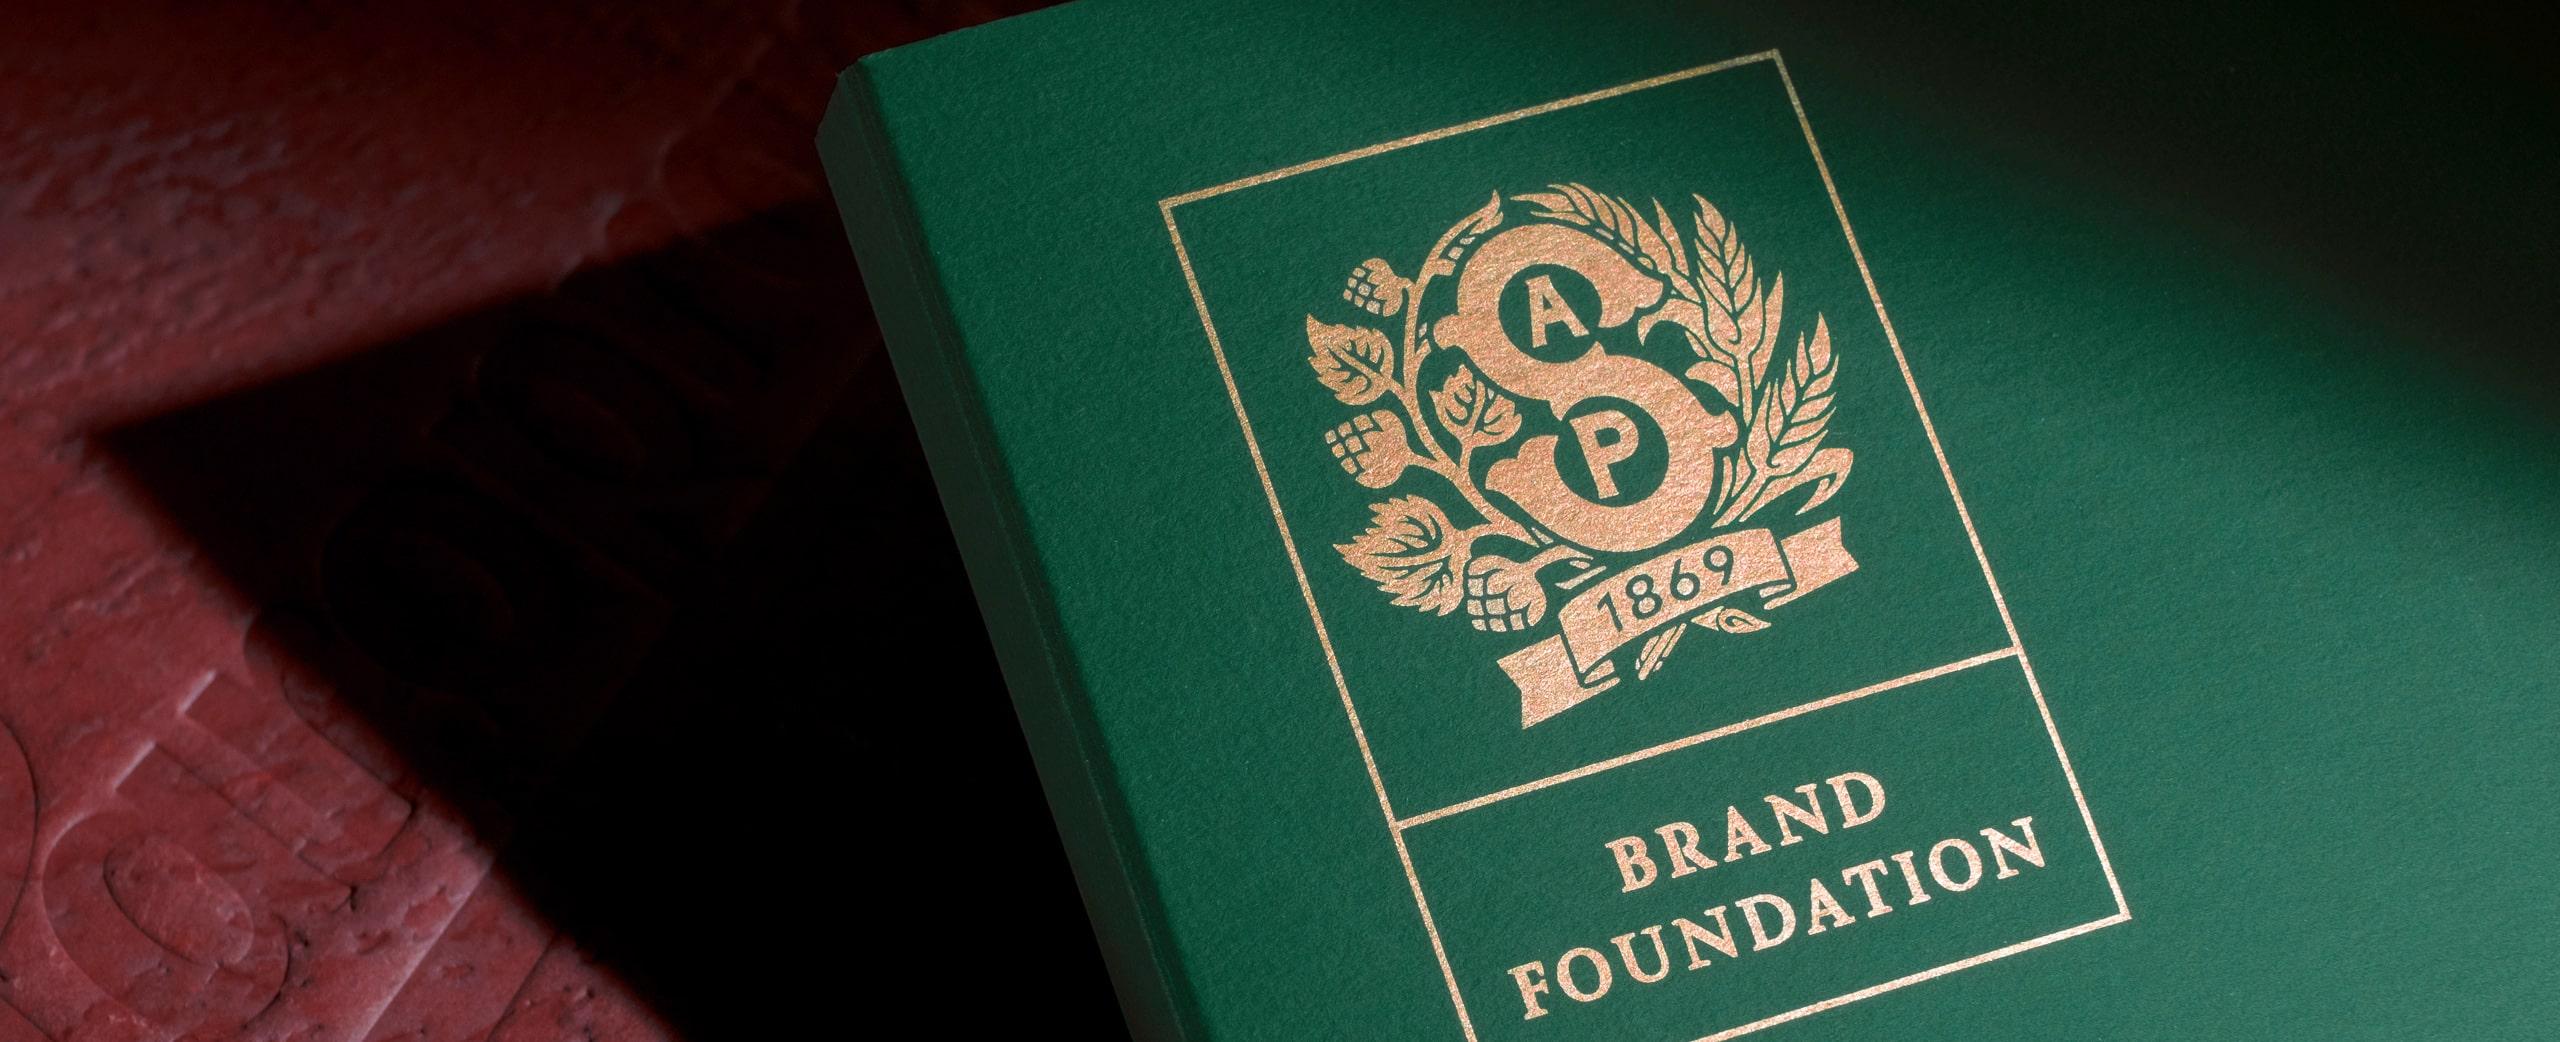 The Multimedia Book of Staropramen Brewery Designed by Cocoon Prague